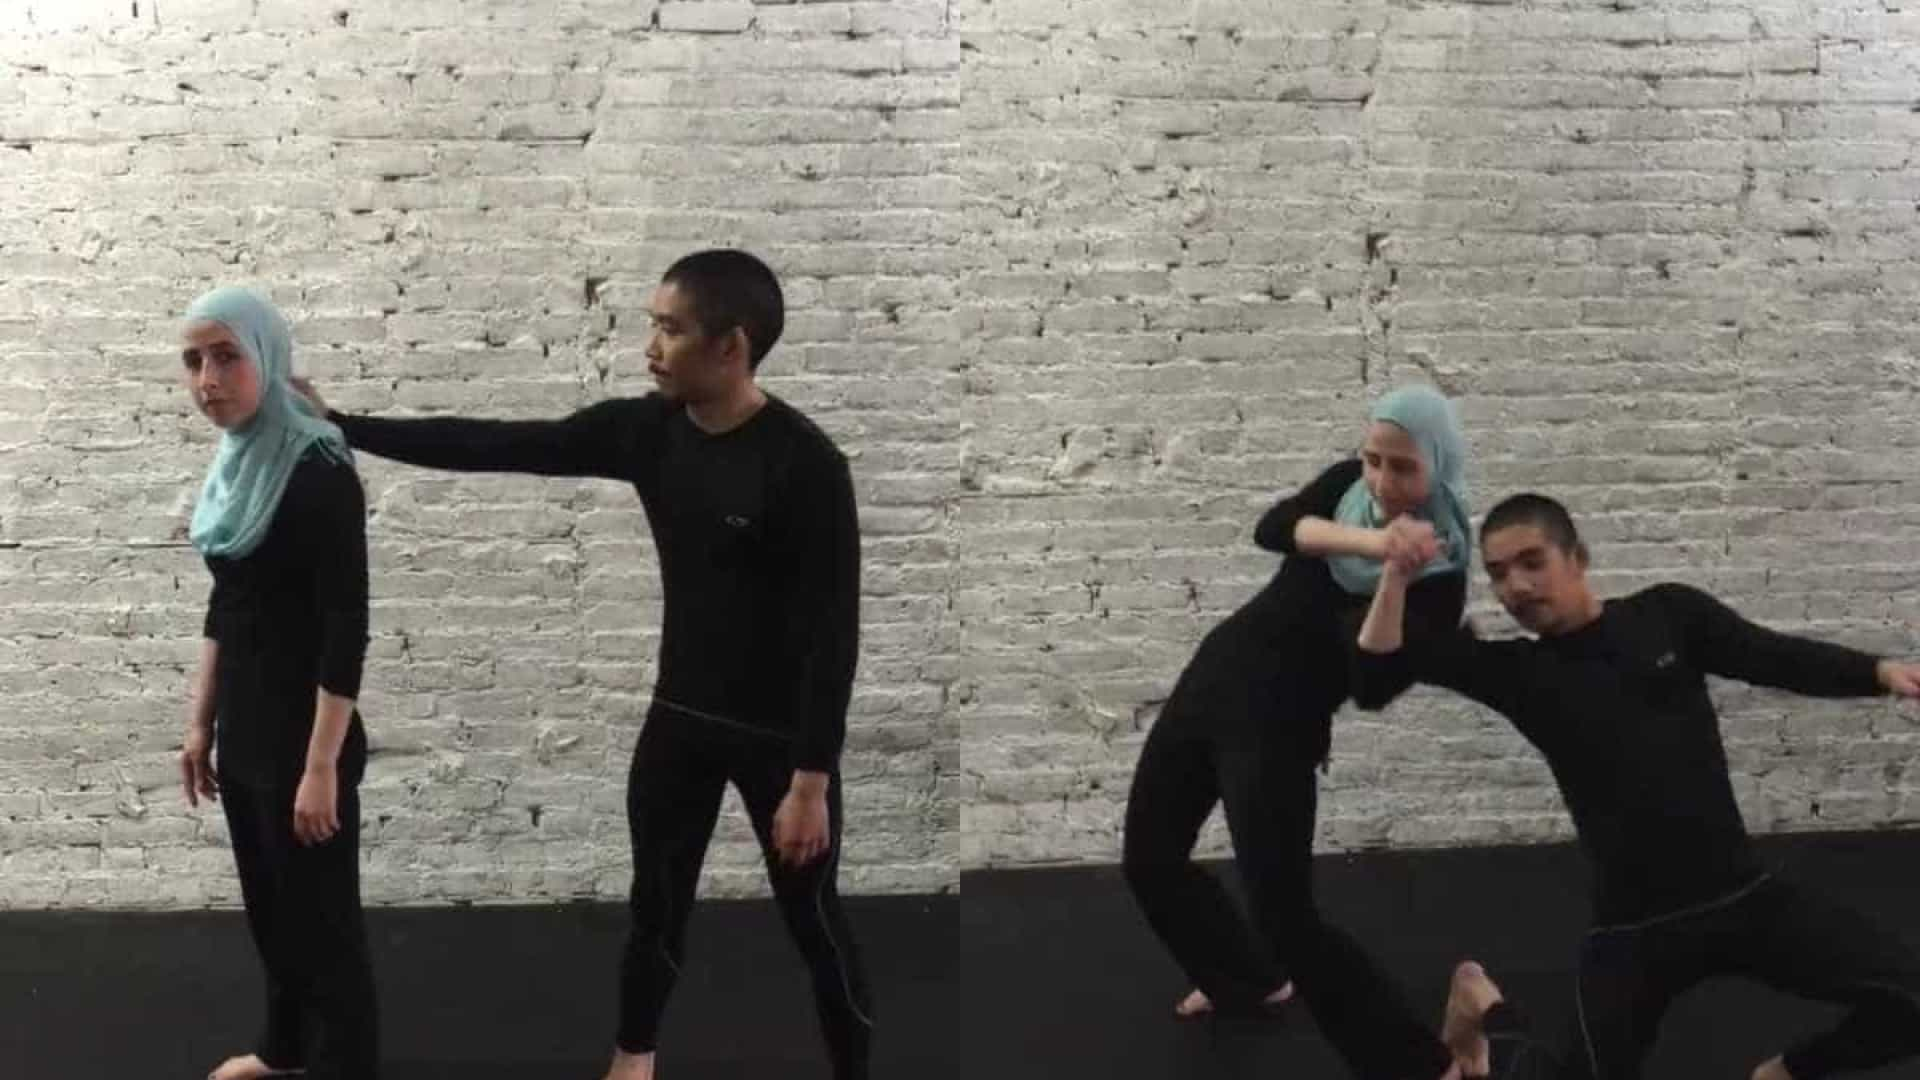 Jovem muçulmana partilha vídeo viral de auto-defesa